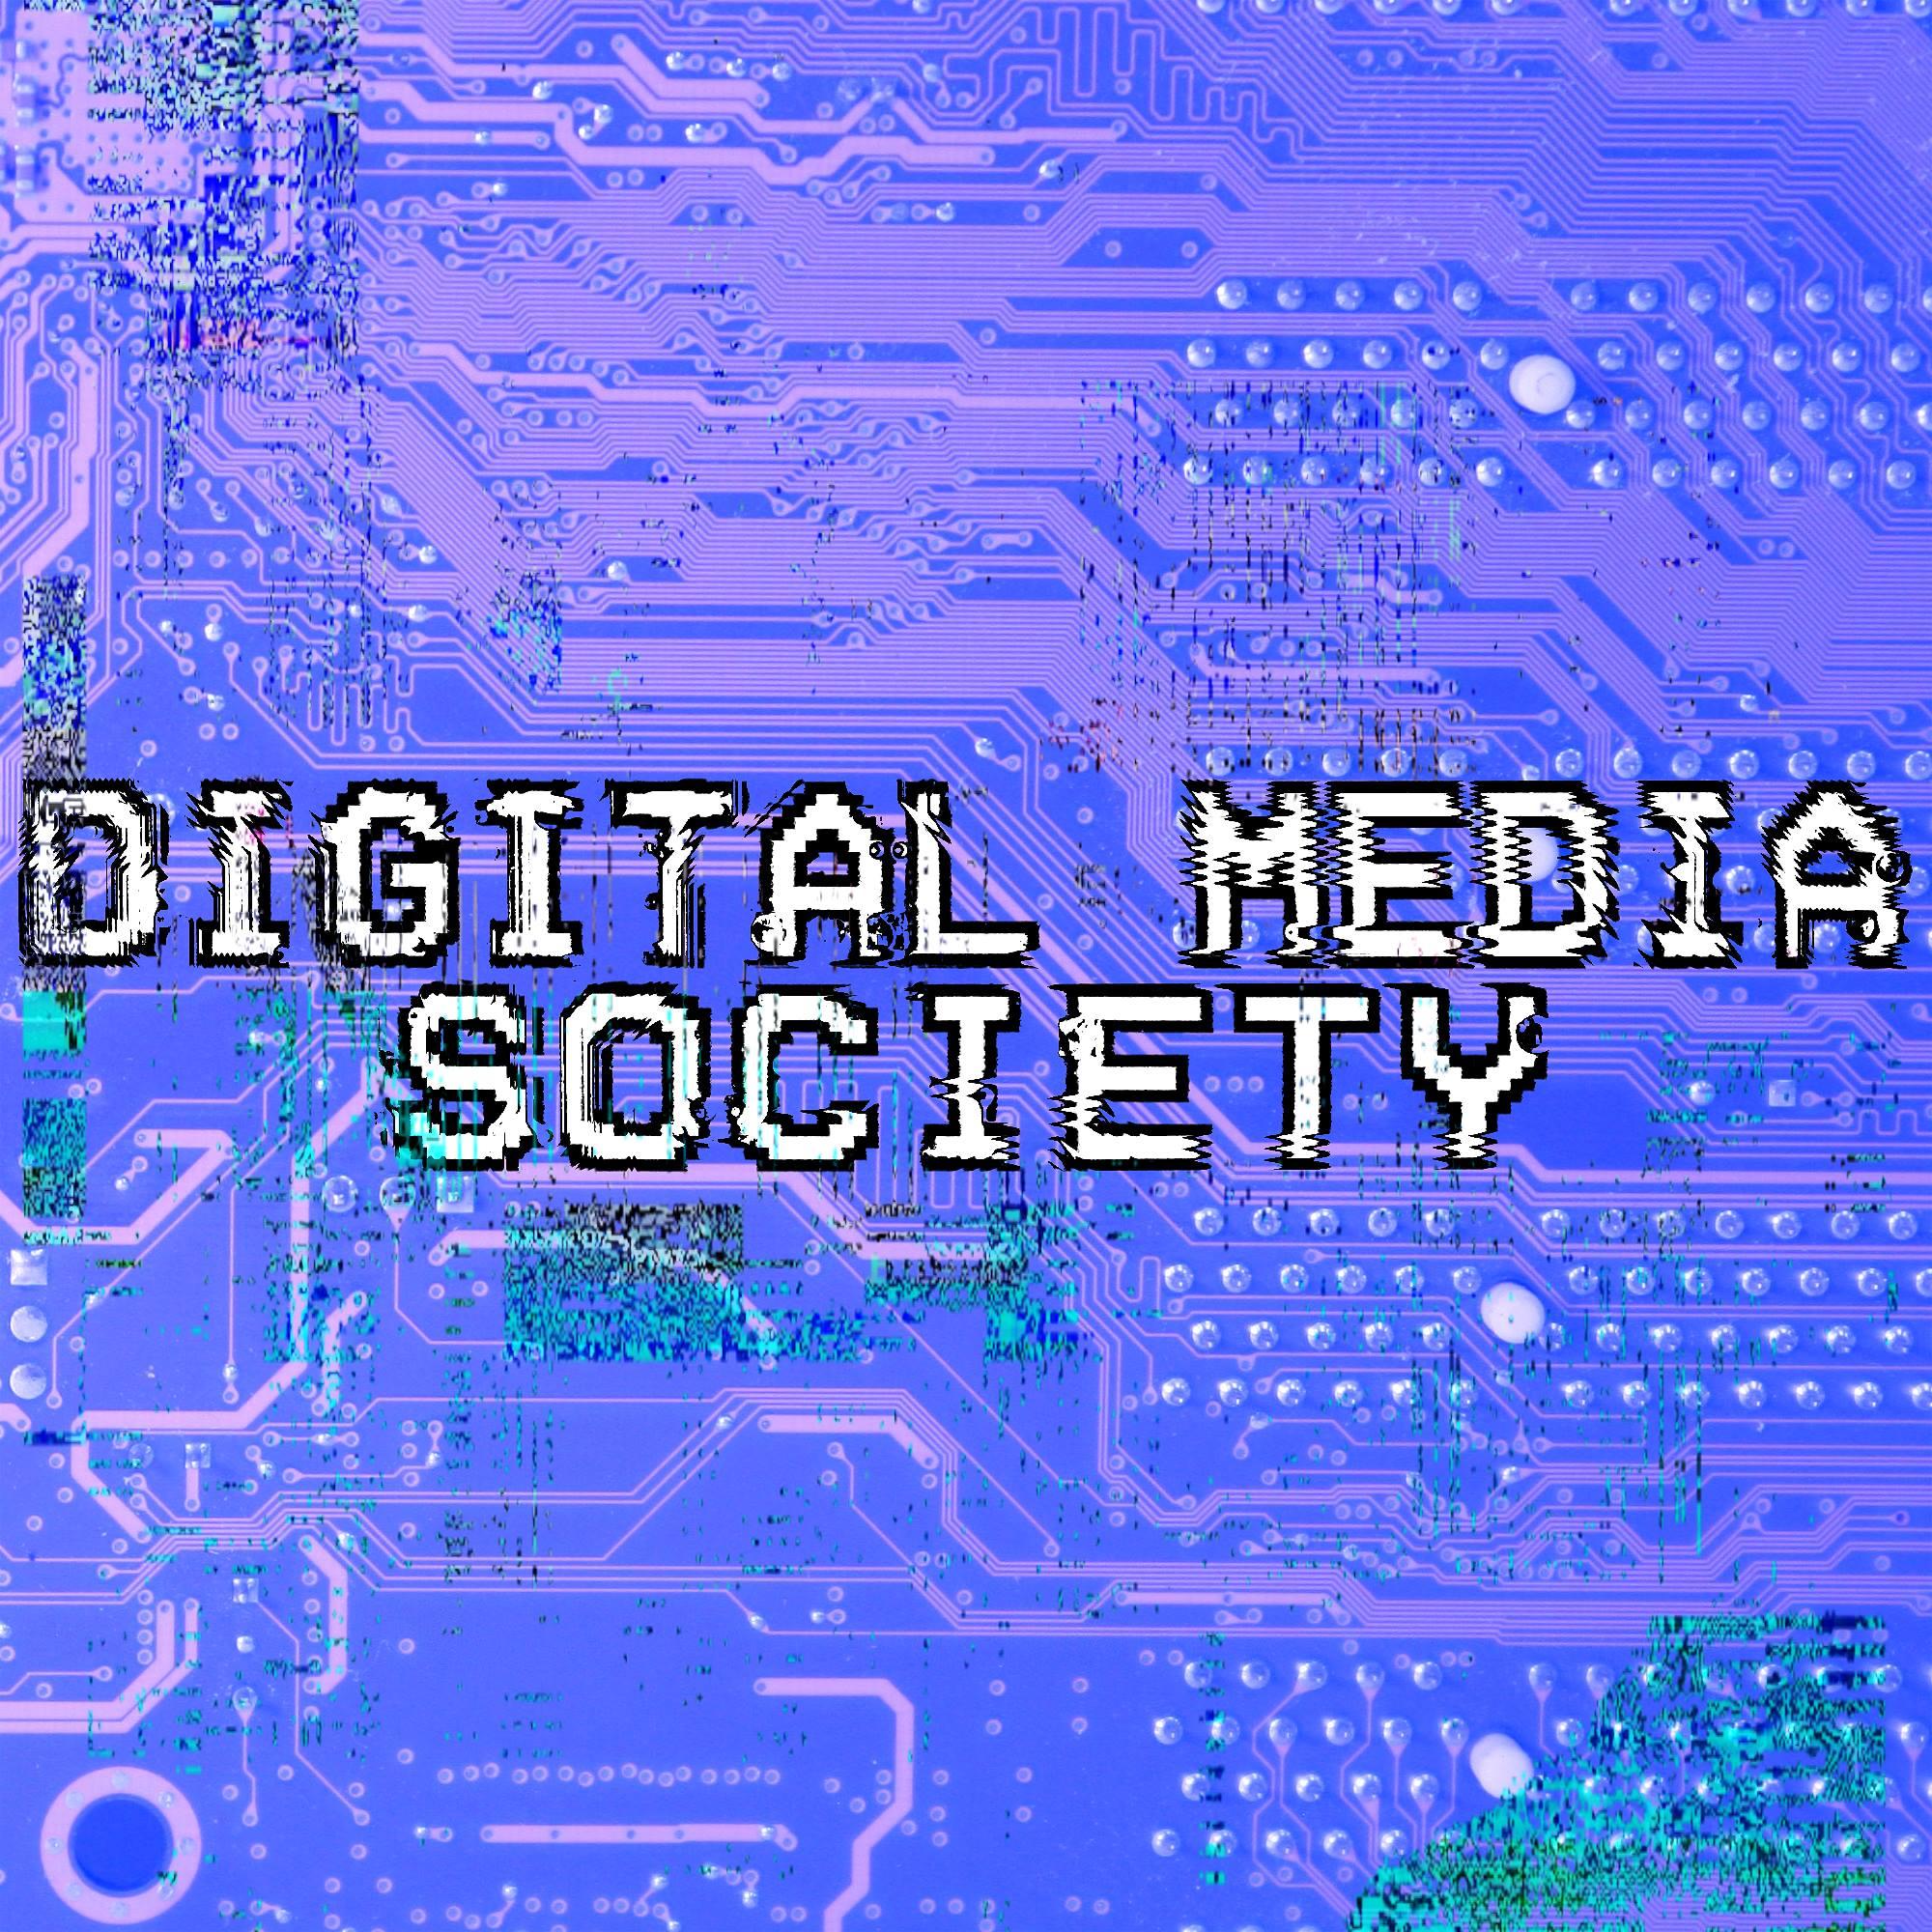 UniClubs - UOW Digital Media Society Logo